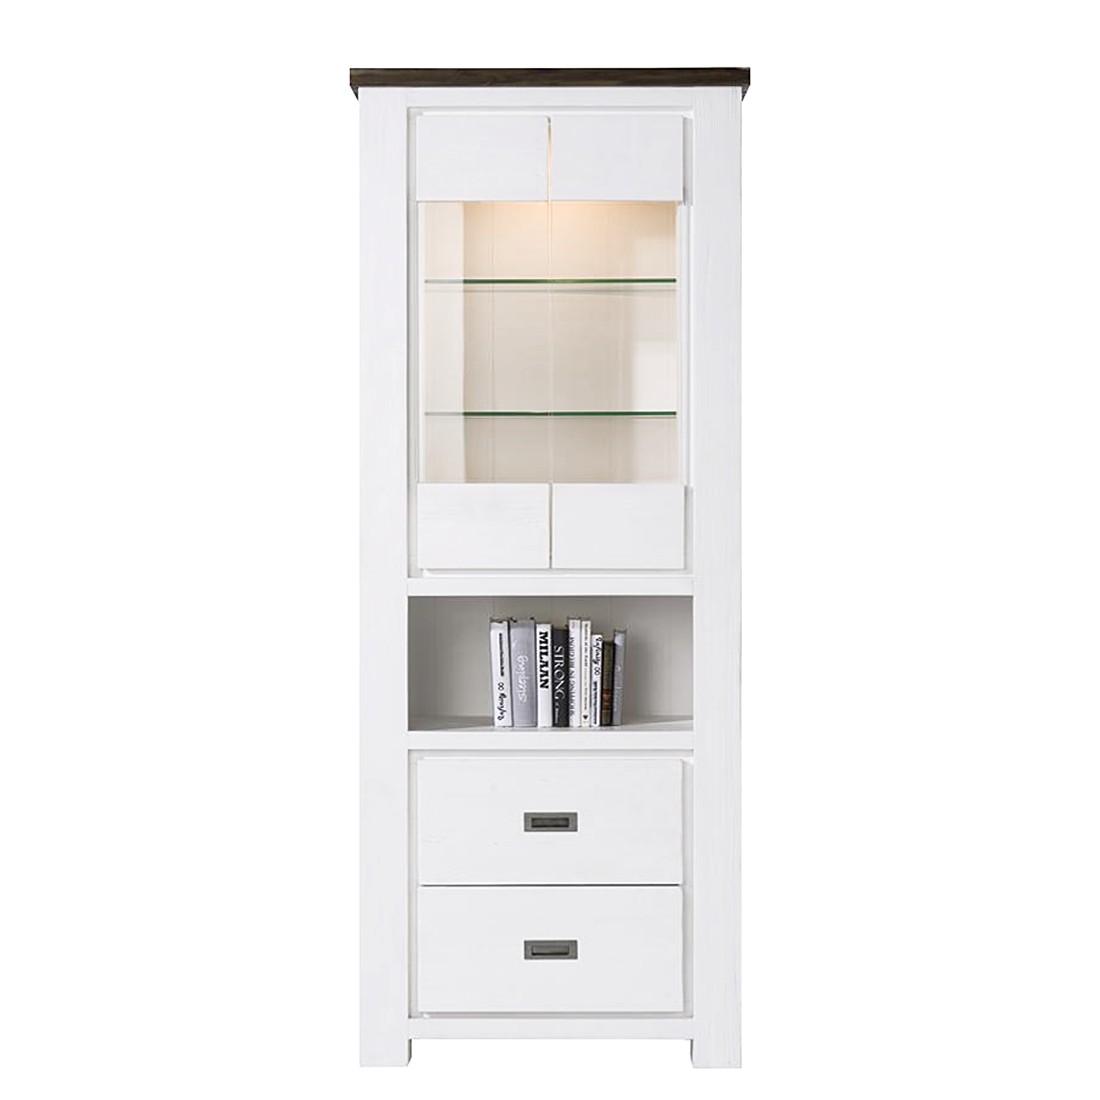 Home 24 - Eek a+, vitrine deaumain - eclairage fourni - acacia partiellement massif - blanc, habufa